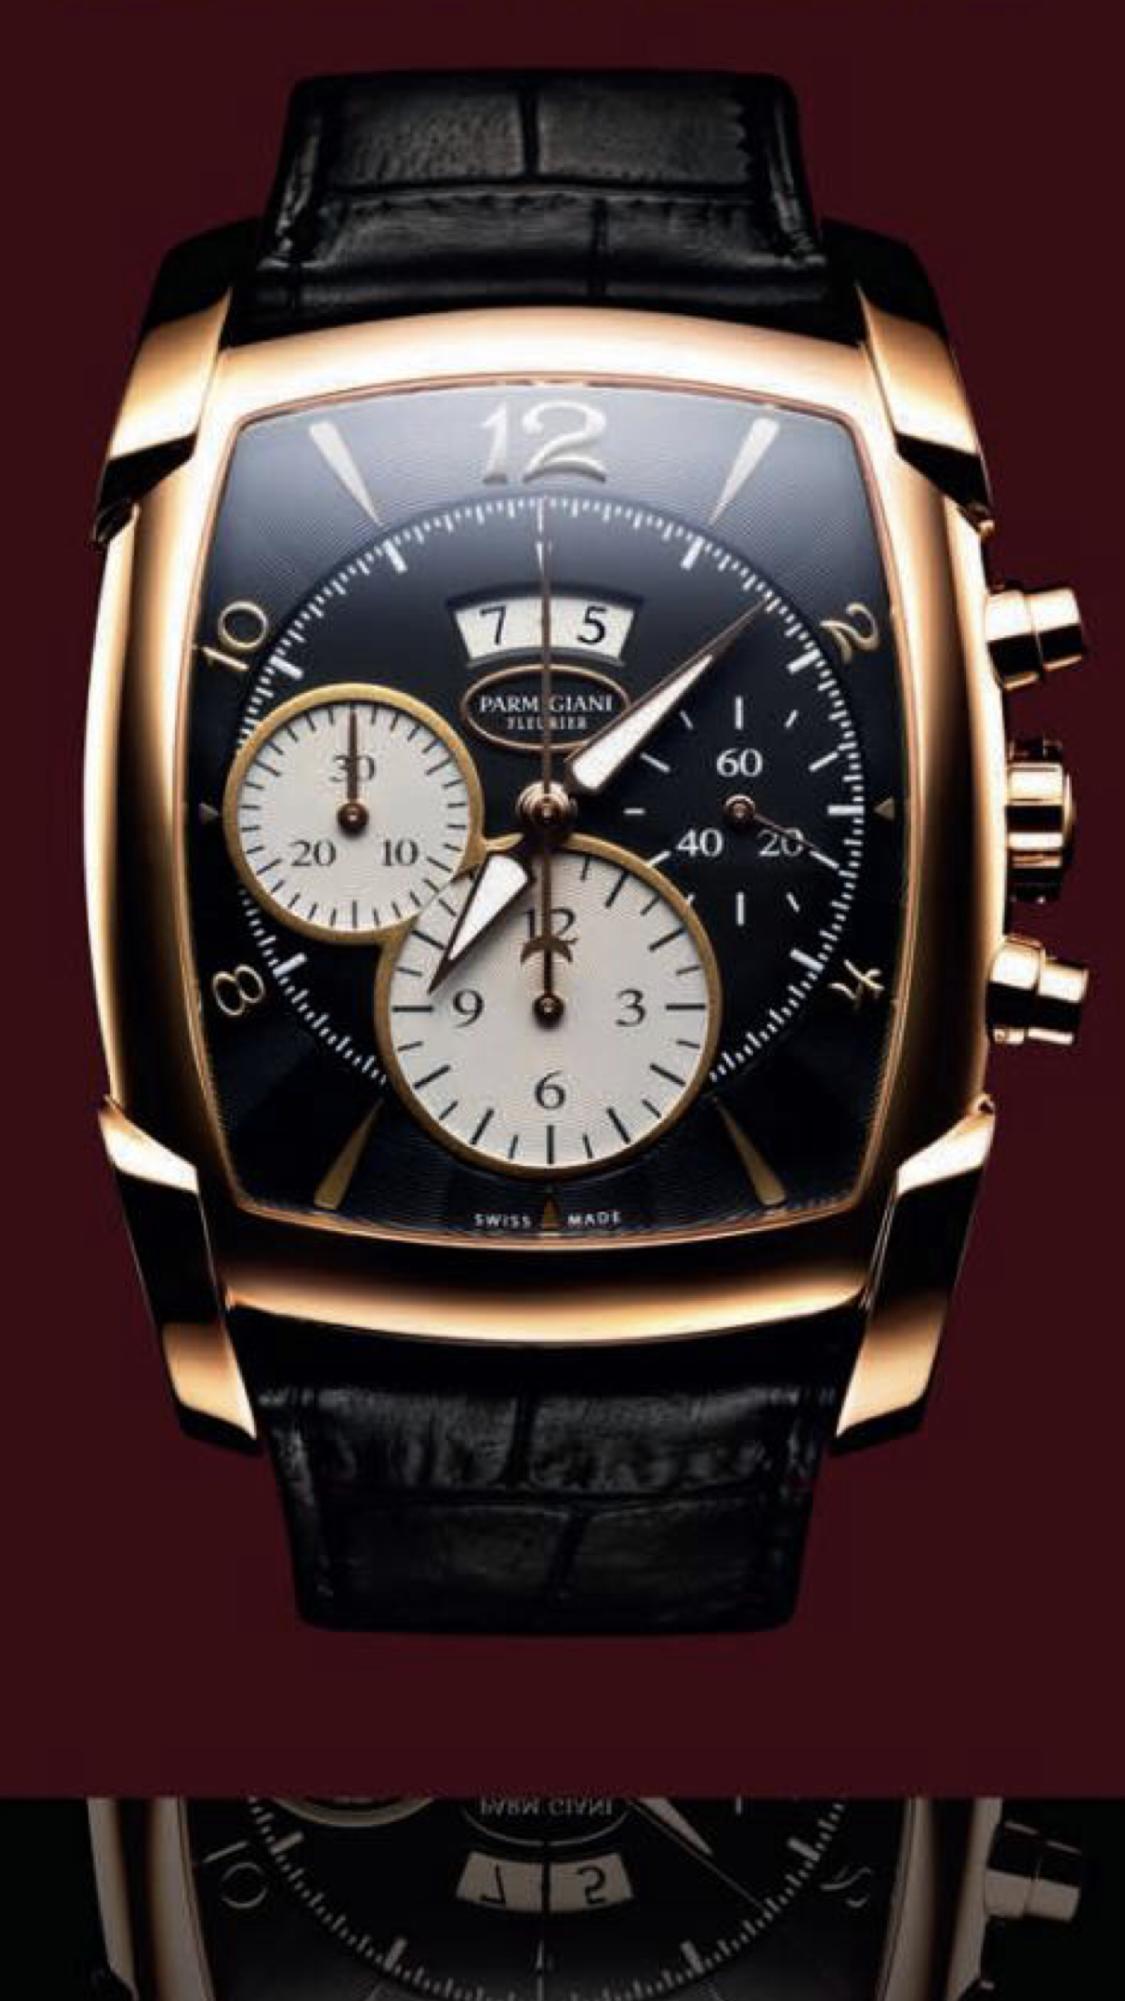 43eef5e38b7d Pin από το χρήστη Alex P στον πίνακα watches